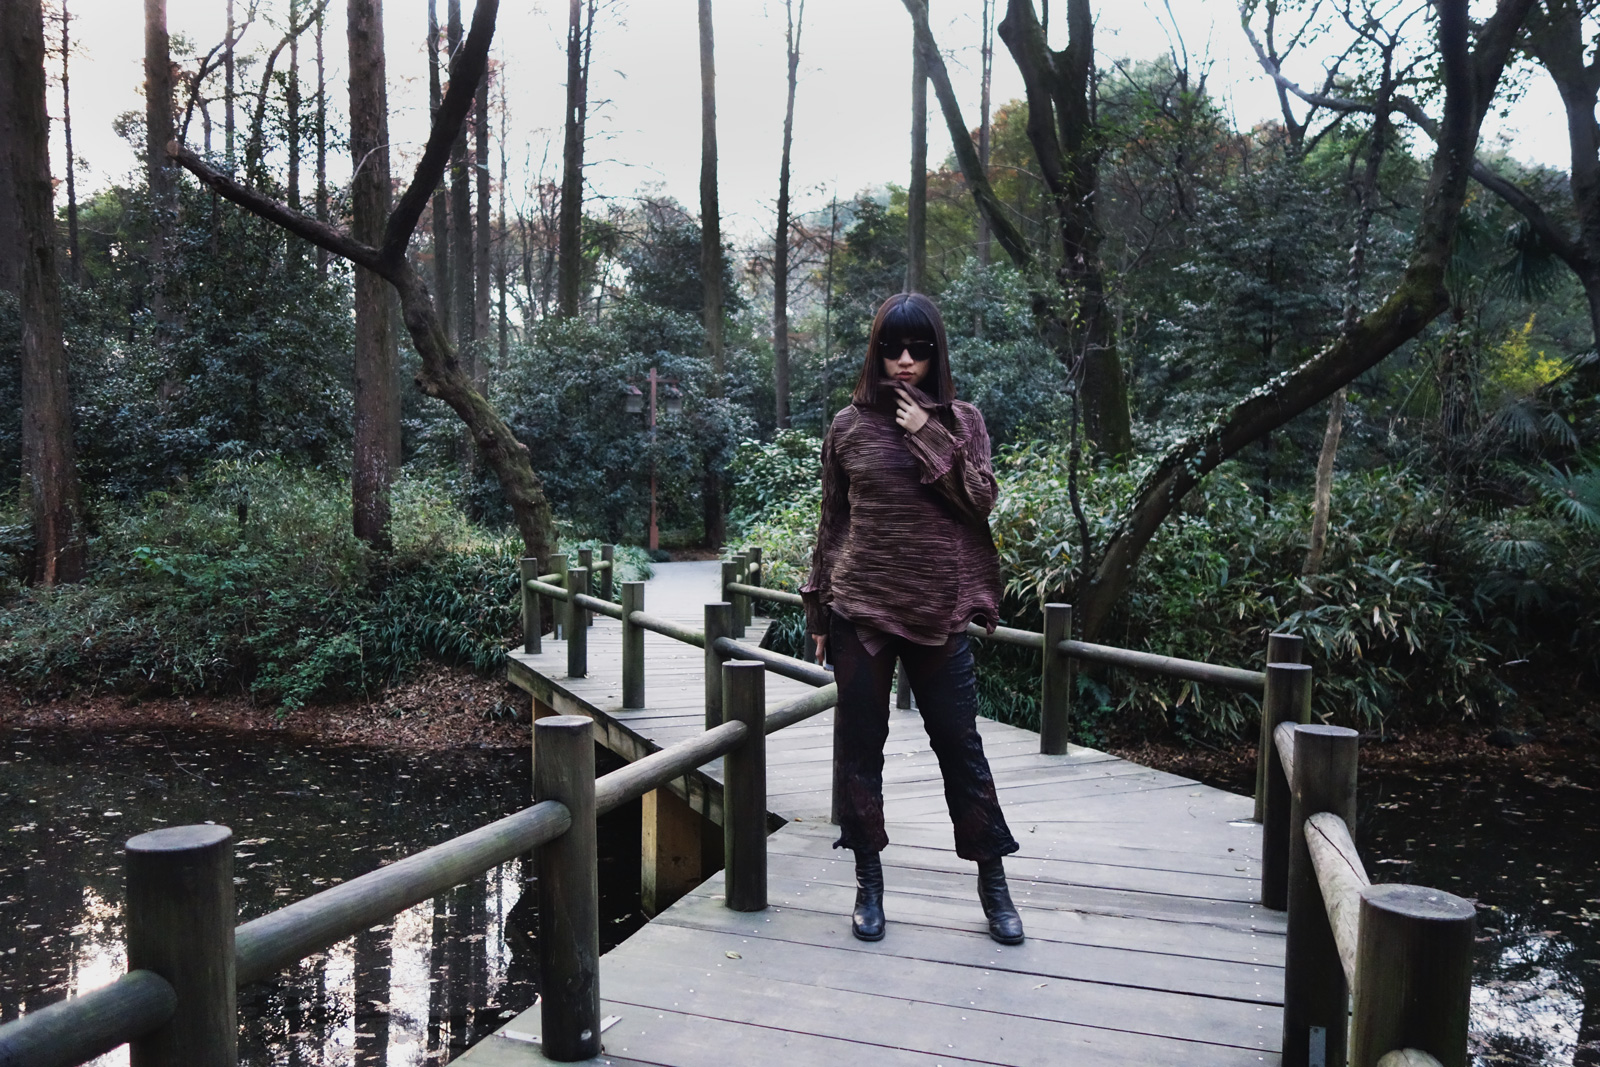 Issey Miyake Beetle Jacket in Hangzhou